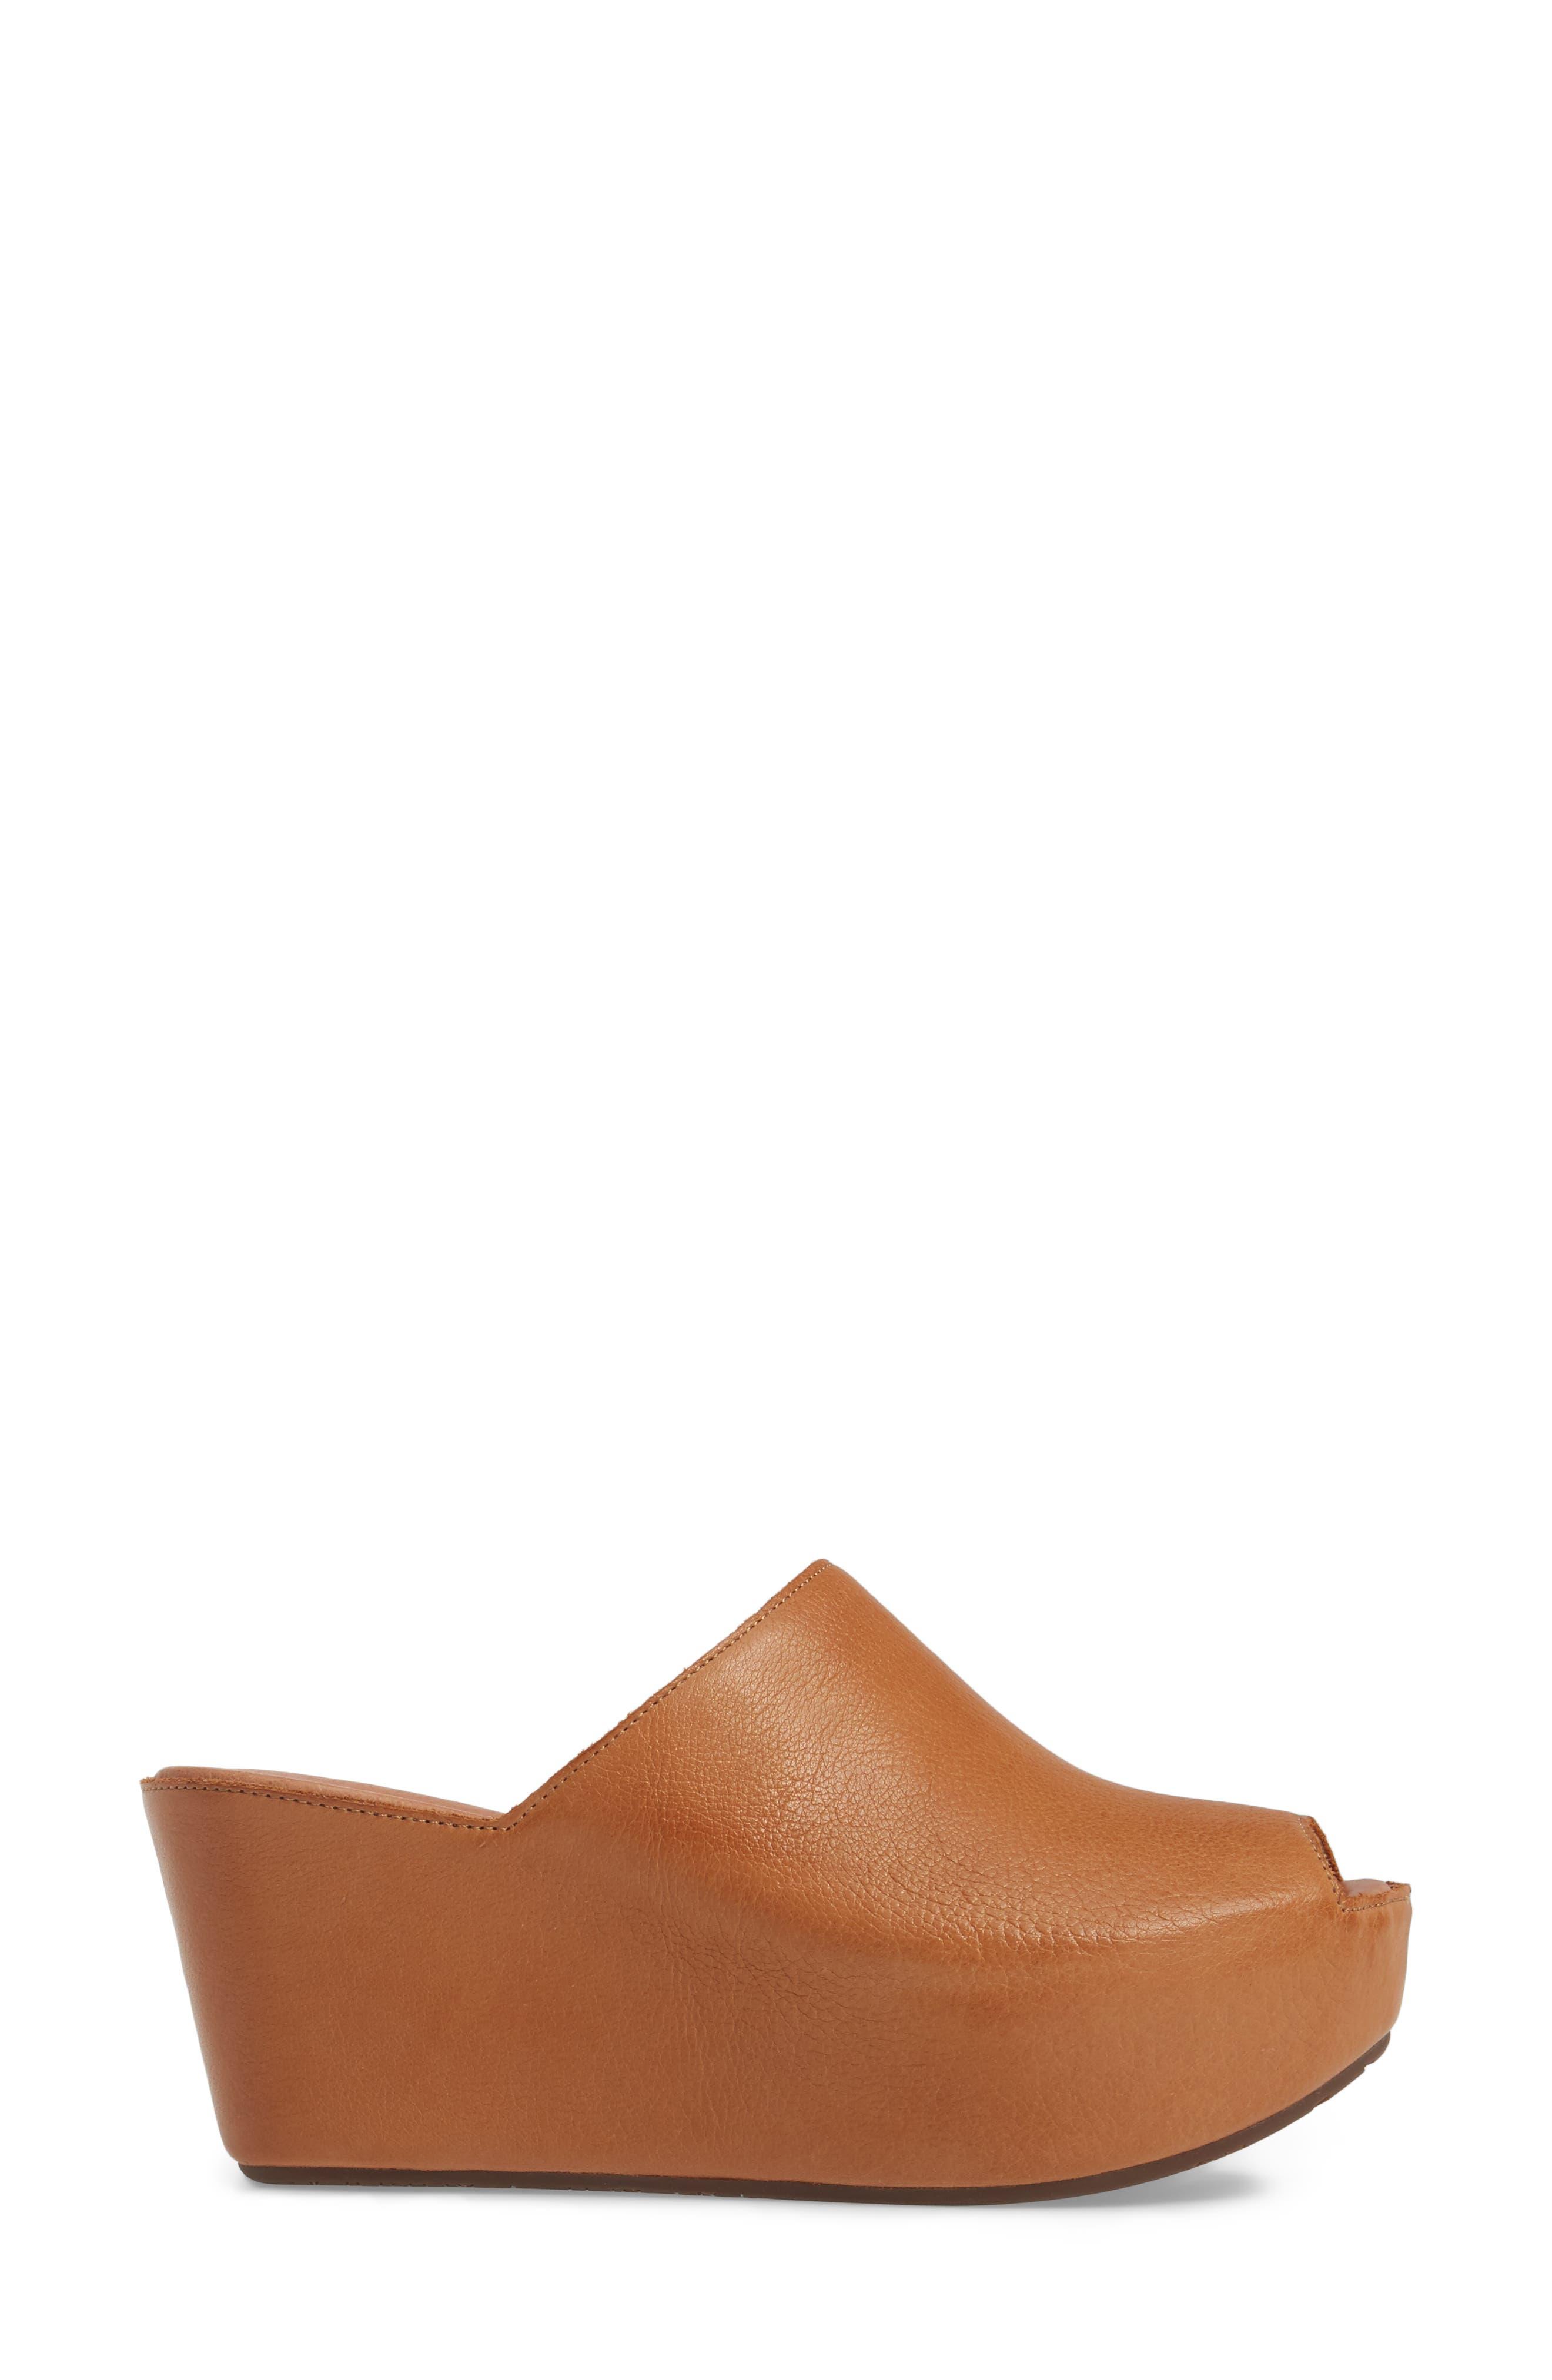 Willa Platform Wedge Mule,                             Alternate thumbnail 3, color,                             Camel Leather